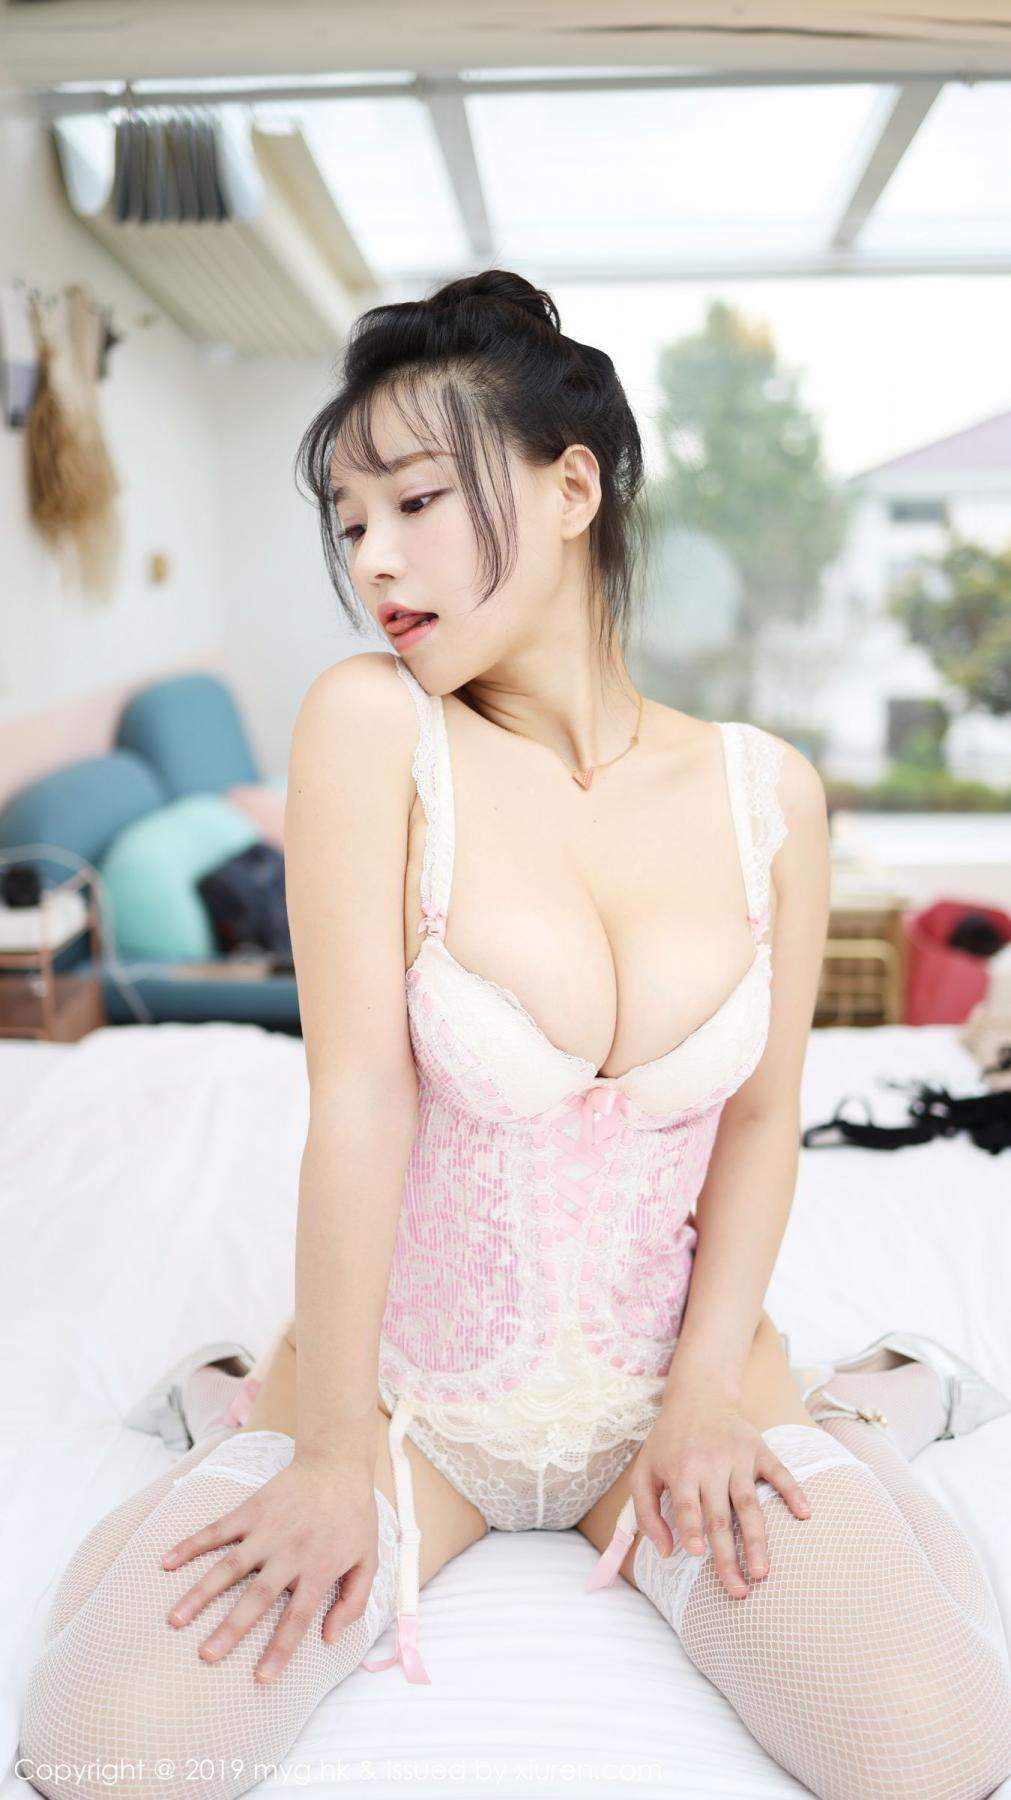 MyGirl Vol. 383 Zhu Ke Er